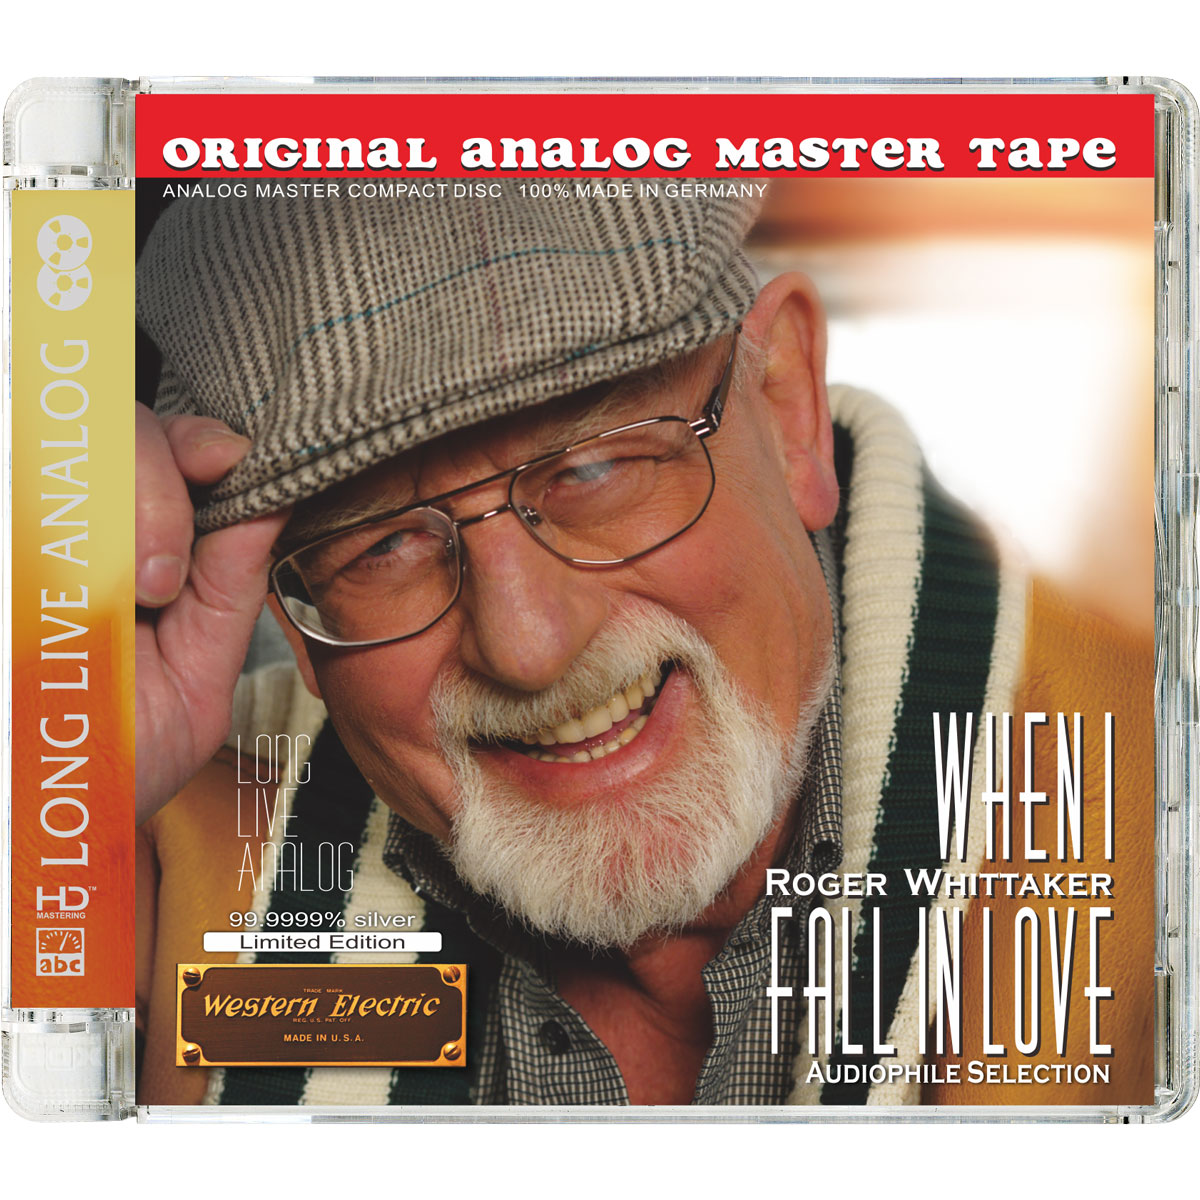 Roger Whittaker-When I Fall in Love